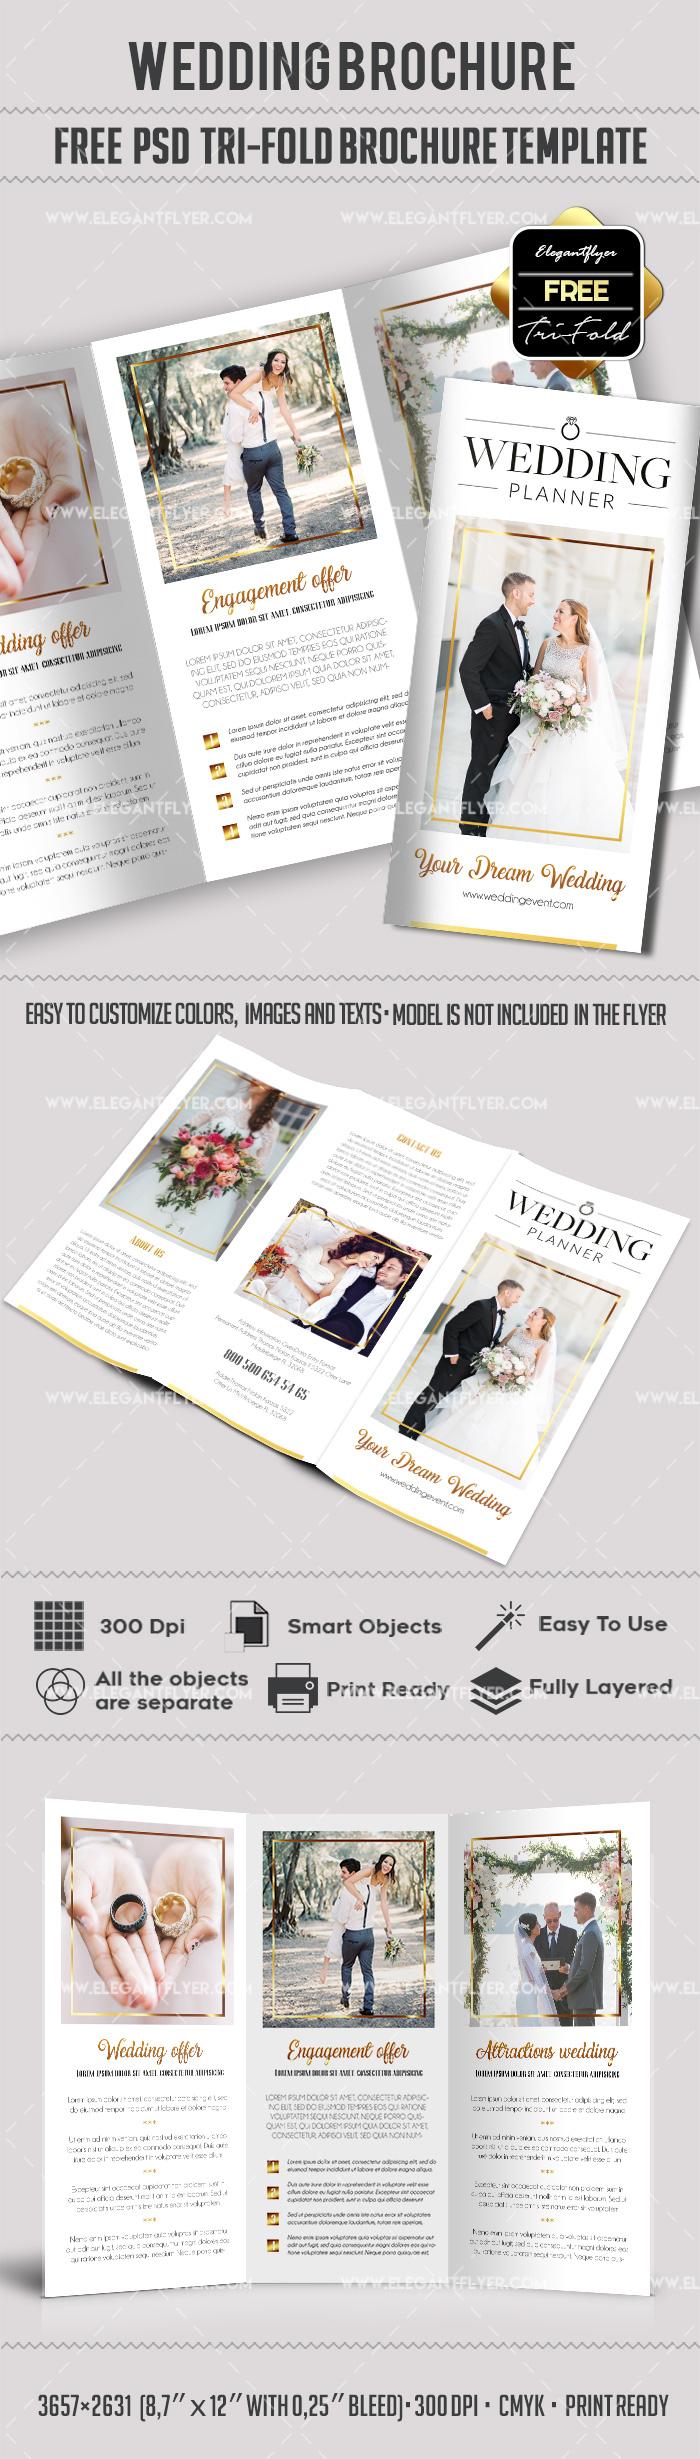 Wedding – Free PSD Tri-Fold Brochure Template | Tri fold brochure ...